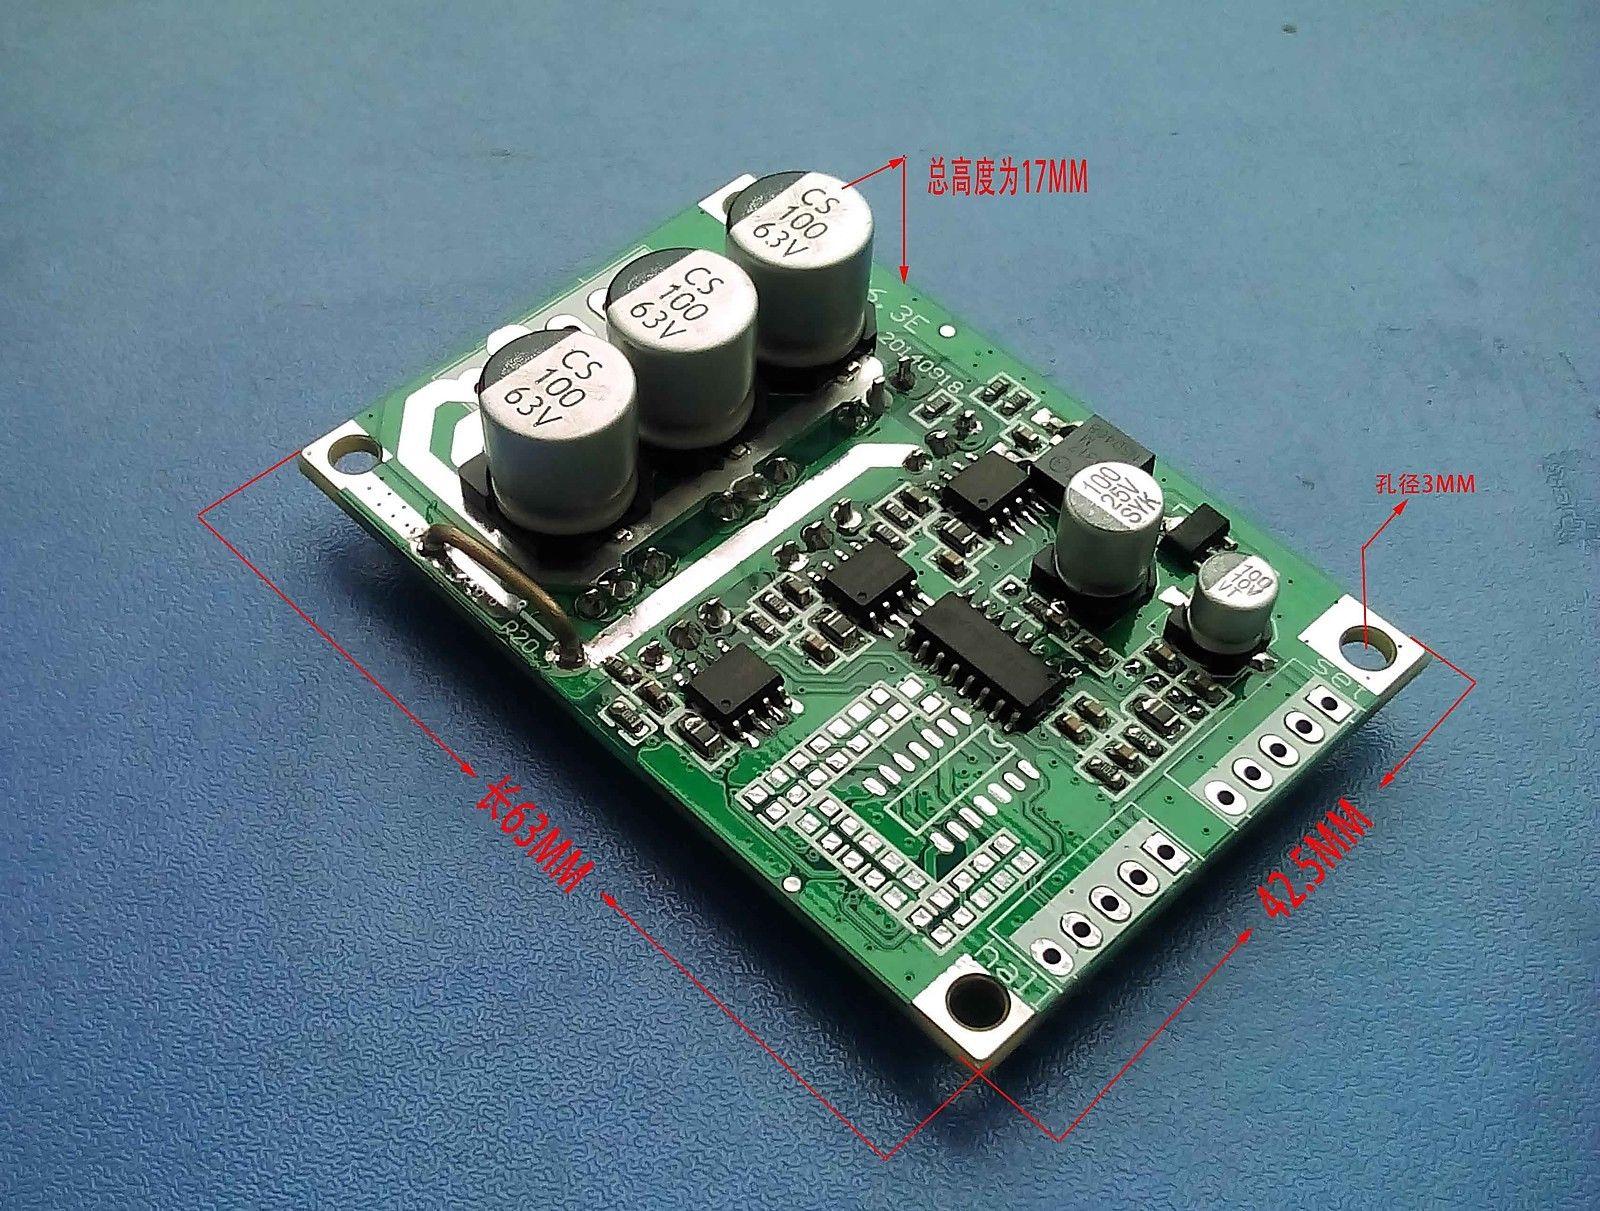 Dc 12v 24v 36v 500w Brushless Motor Drive Board Balanced Car Bldc Control Circuit Controller Hall Driver